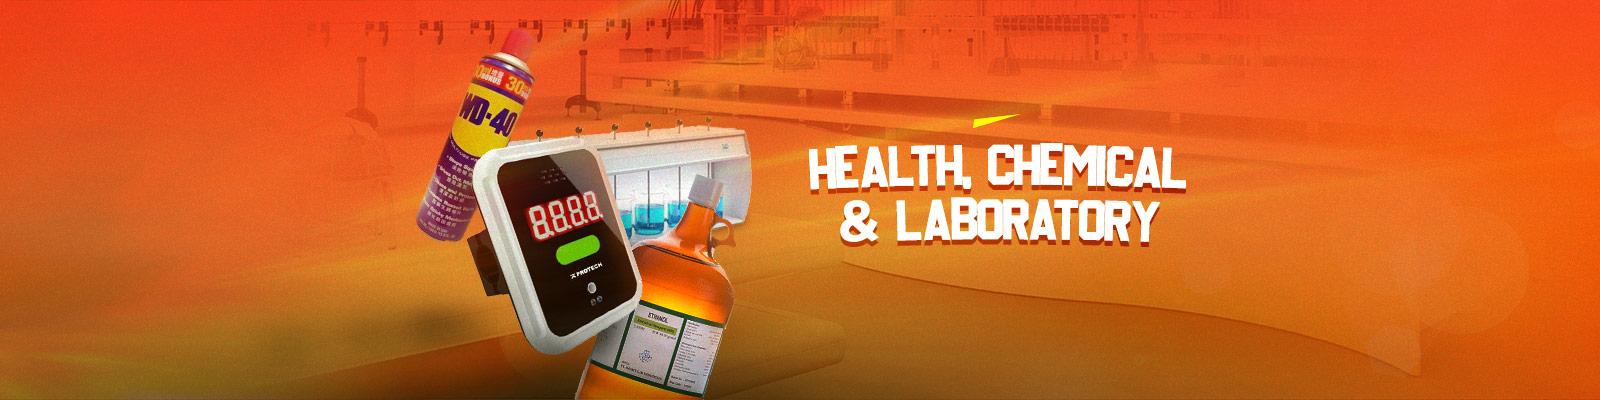 Alat-Alat Lab dan Bahan Kimia